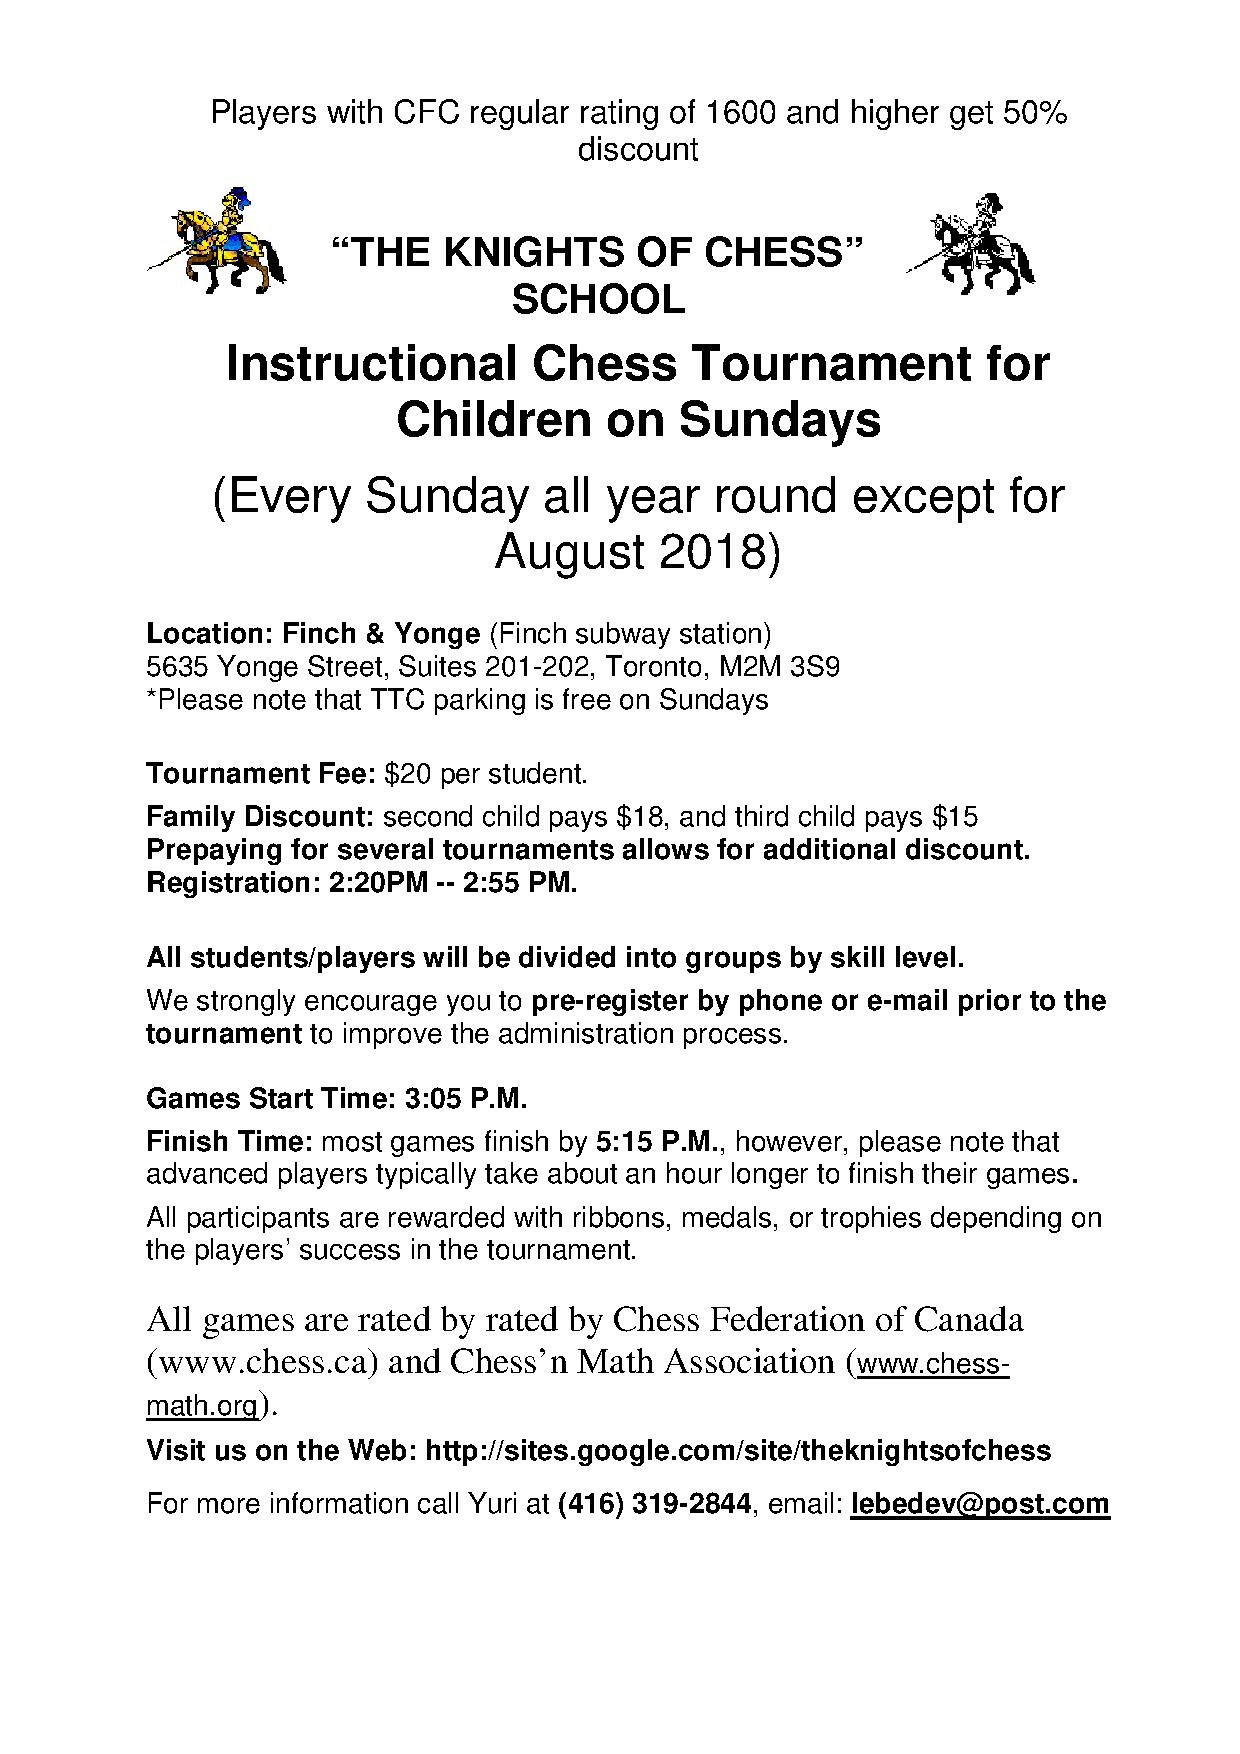 Instructional Chess Tournaments for Children | Chess\'n Math Association